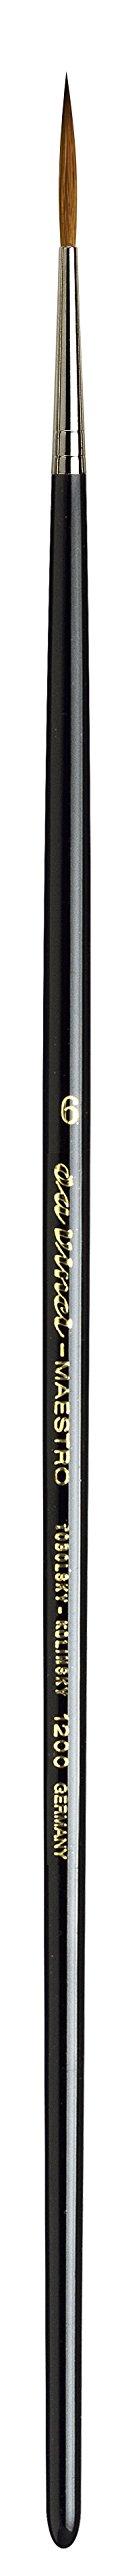 da Vinci Oil & Acrylic Series 1200 Maestro Rigger Brush, Medium-Length Sharp Needle-Point Kolinsky Red Sable with Black Polished Handle, Size 6 by da Vinci Brushes